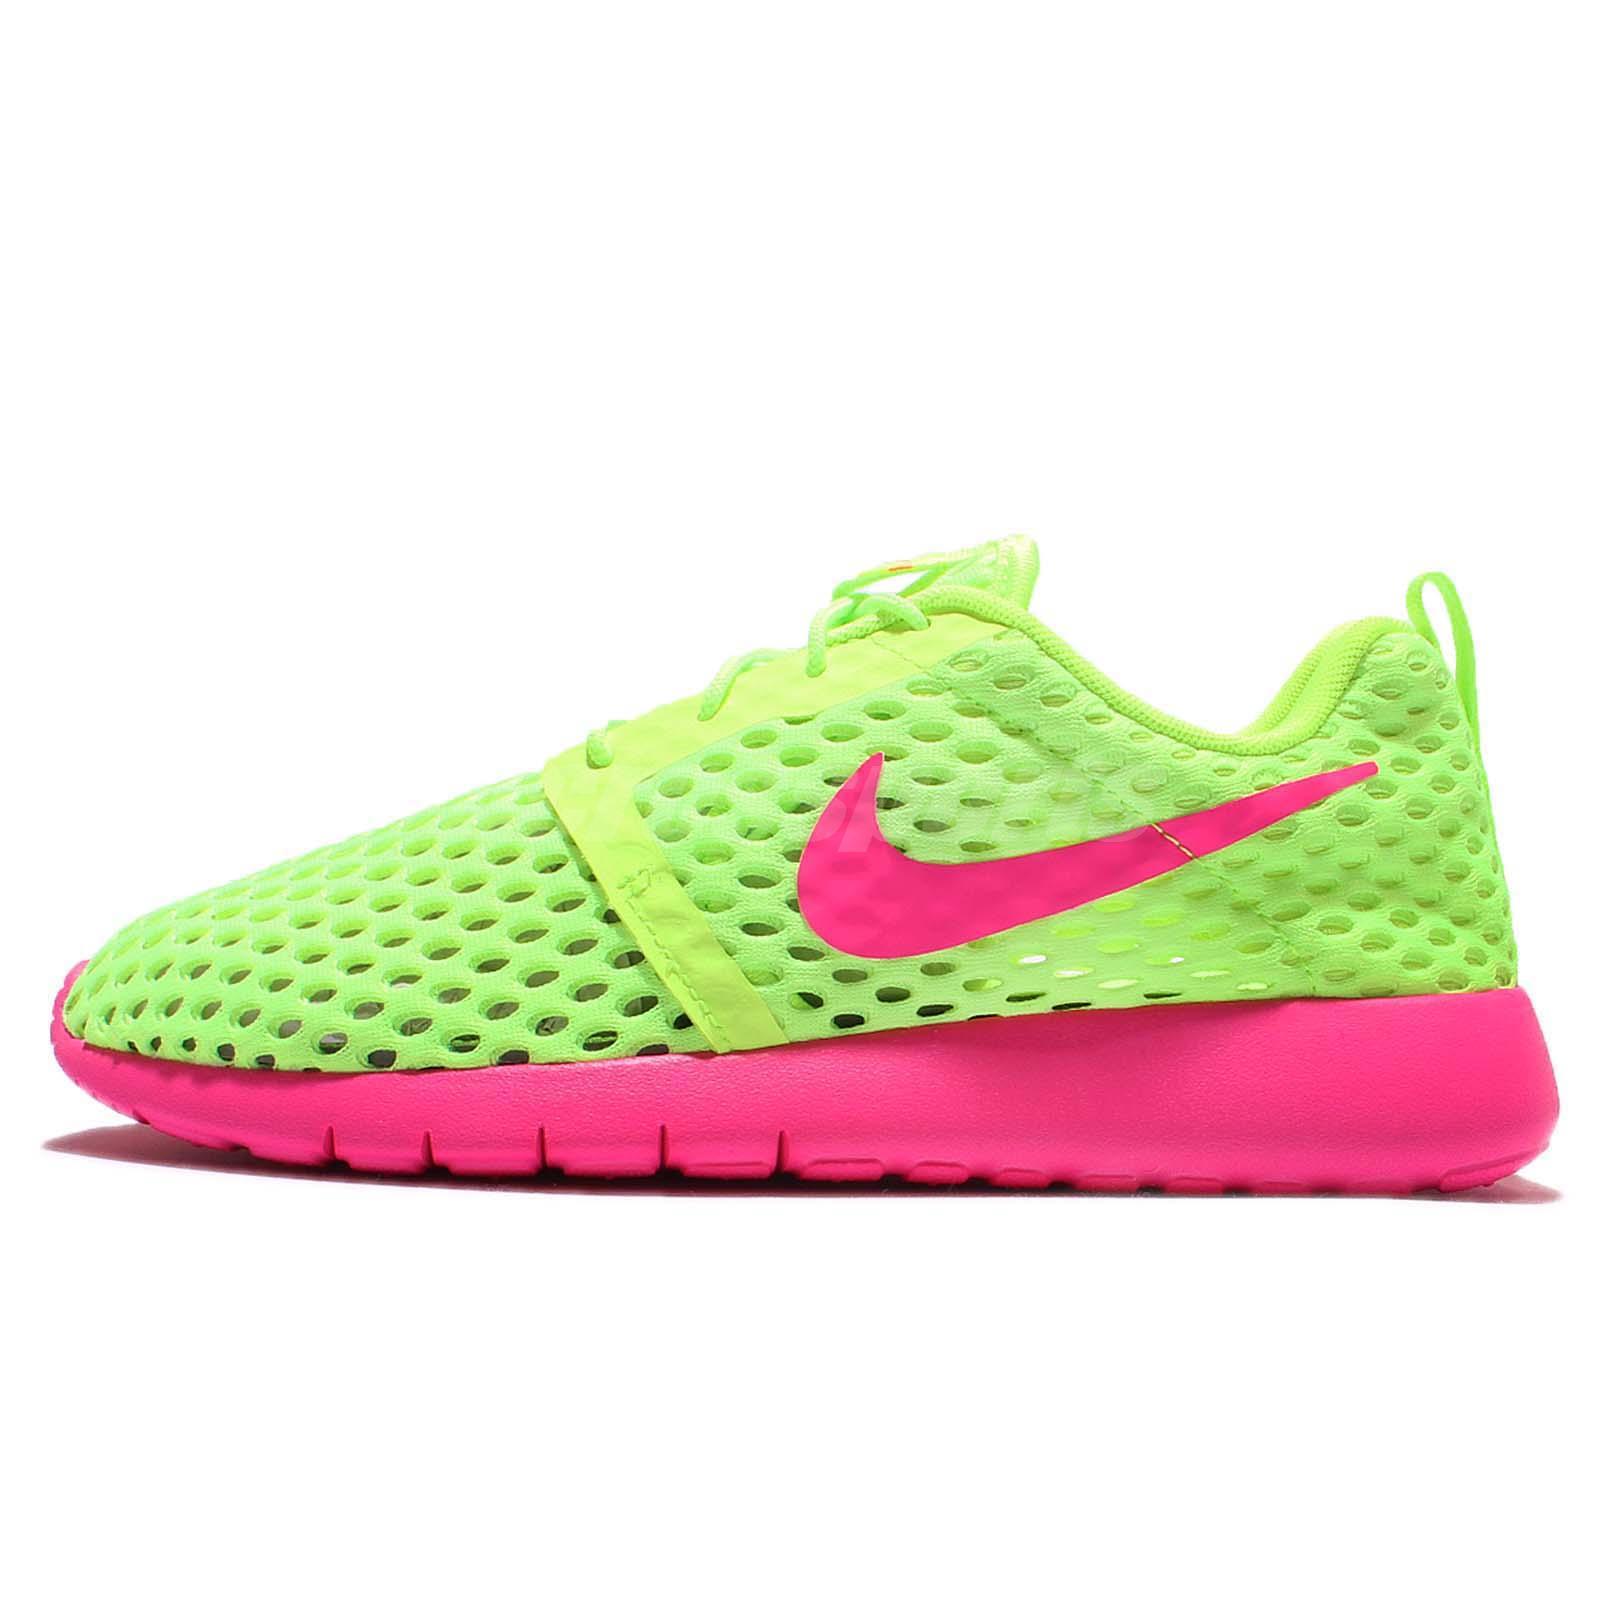 499fe74c4fe5 Nike Roshe One Flight Weight GS Green Pink Kids Running Sneakers 705486-300